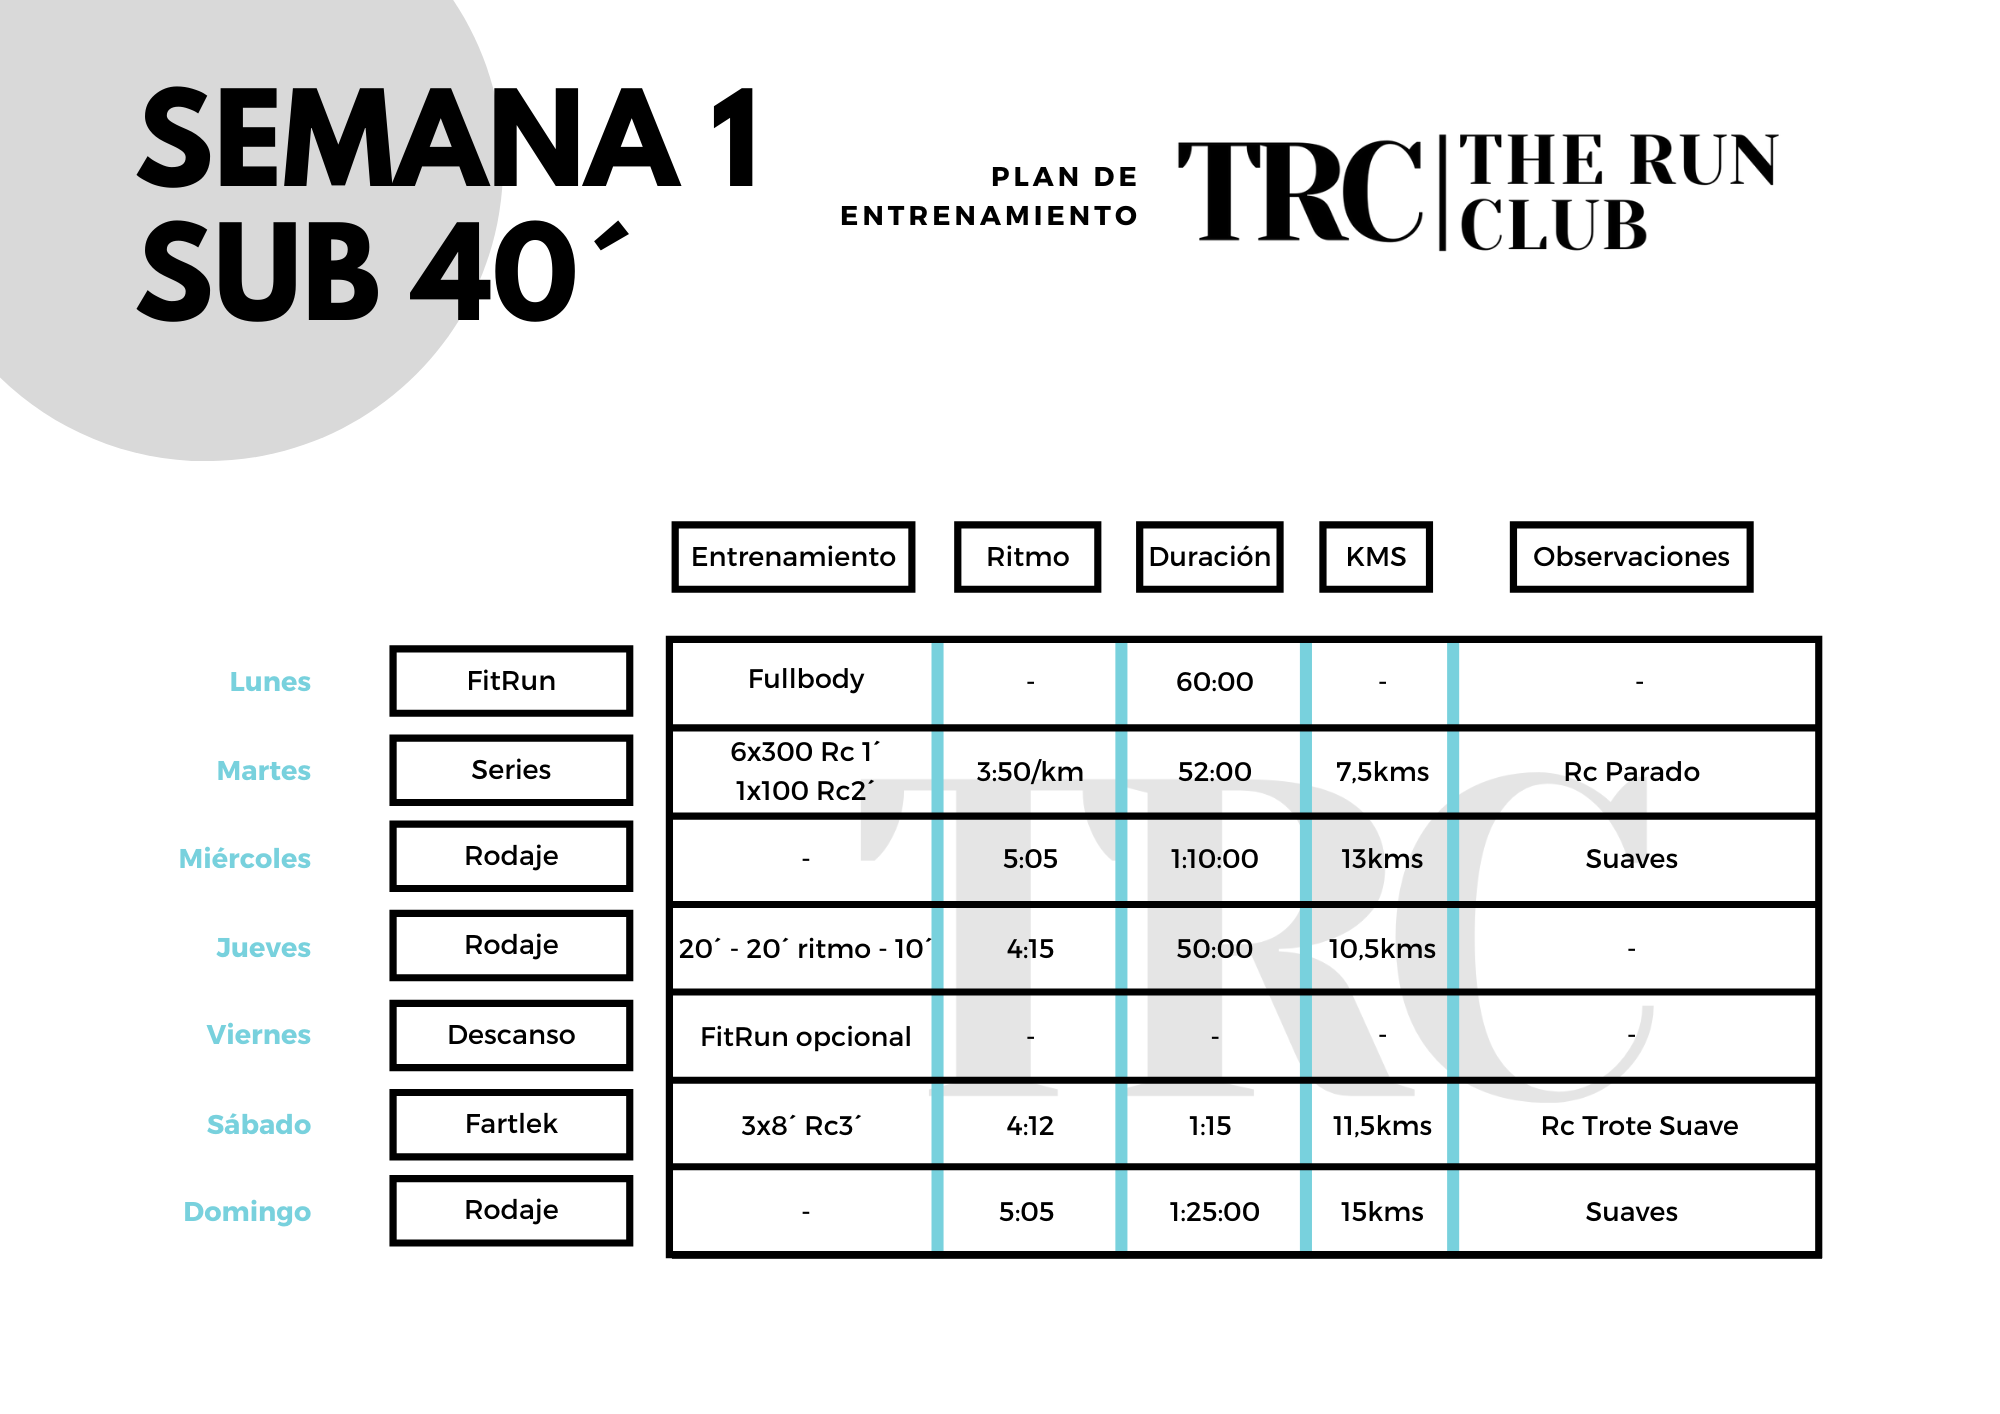 Programa Runner - planning semanal sub 40